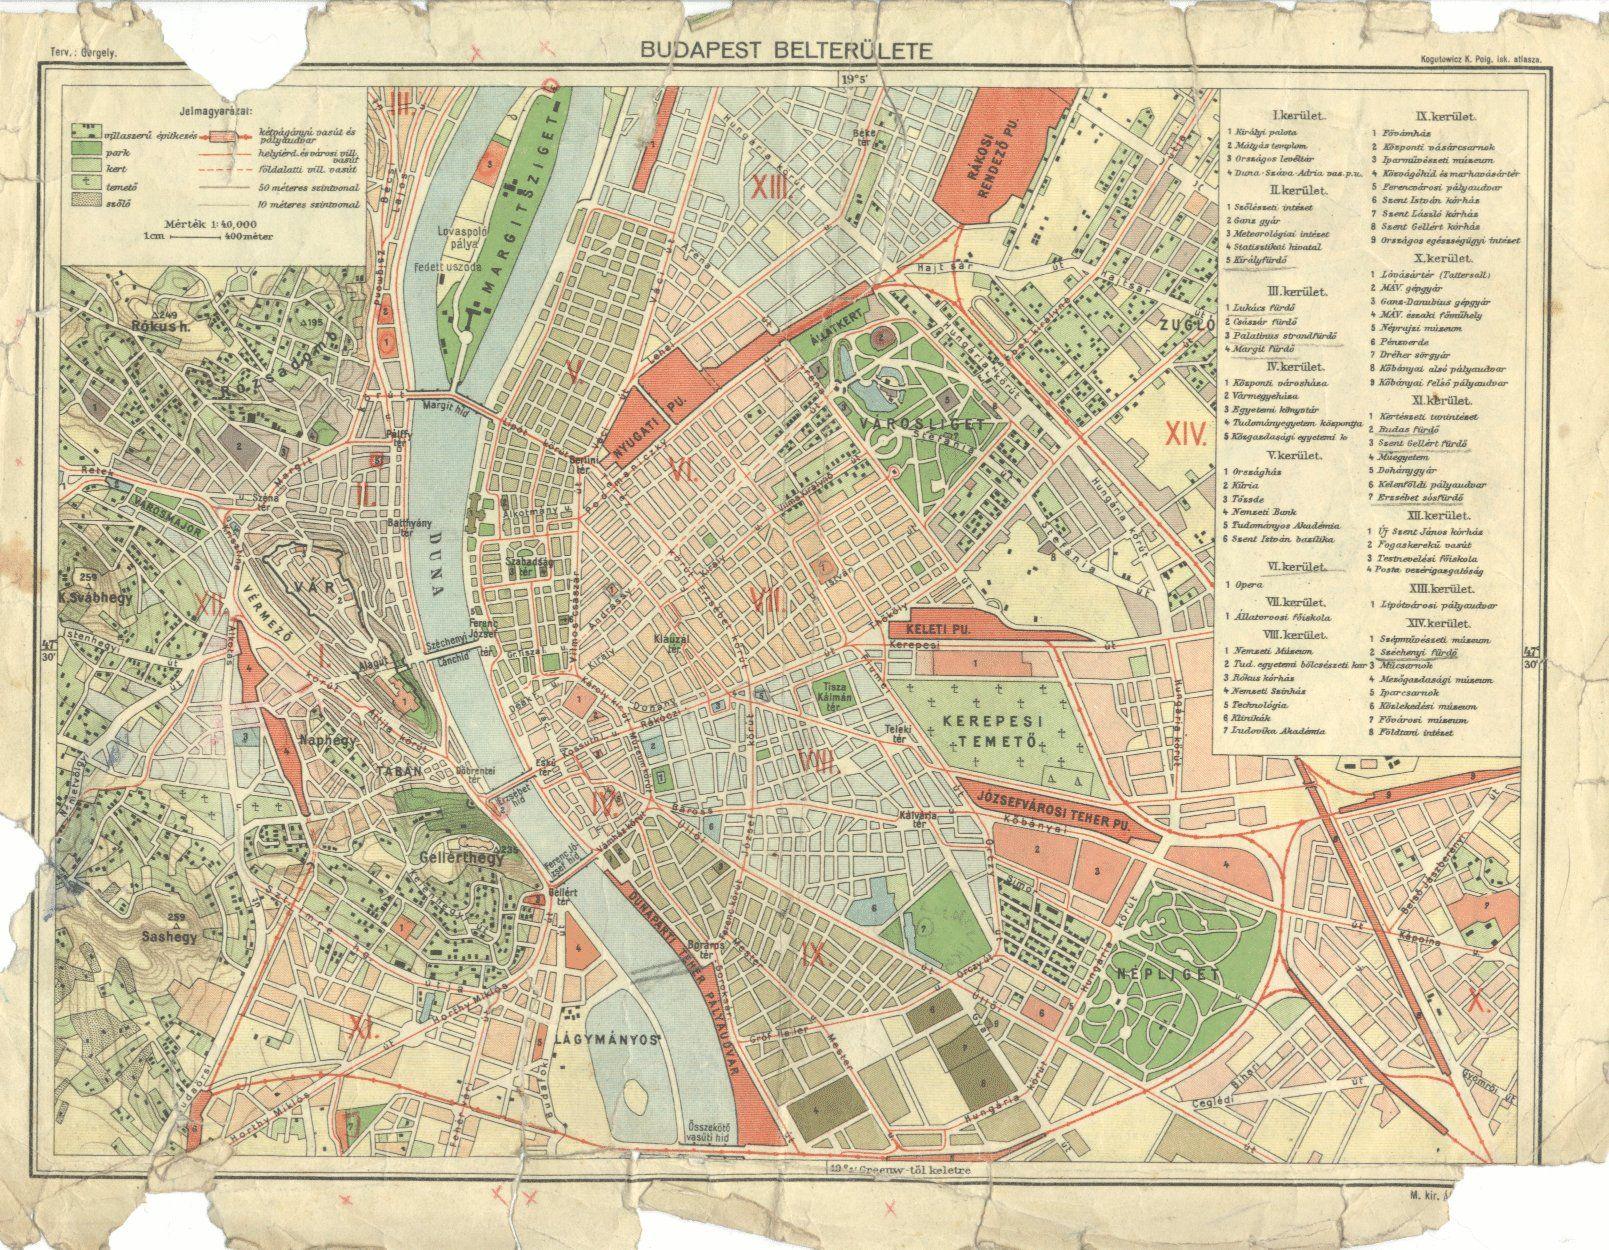 térkép hu budapest http://villamosok.hu/metro/terkep/bp1930. | Budapest retro  térkép hu budapest